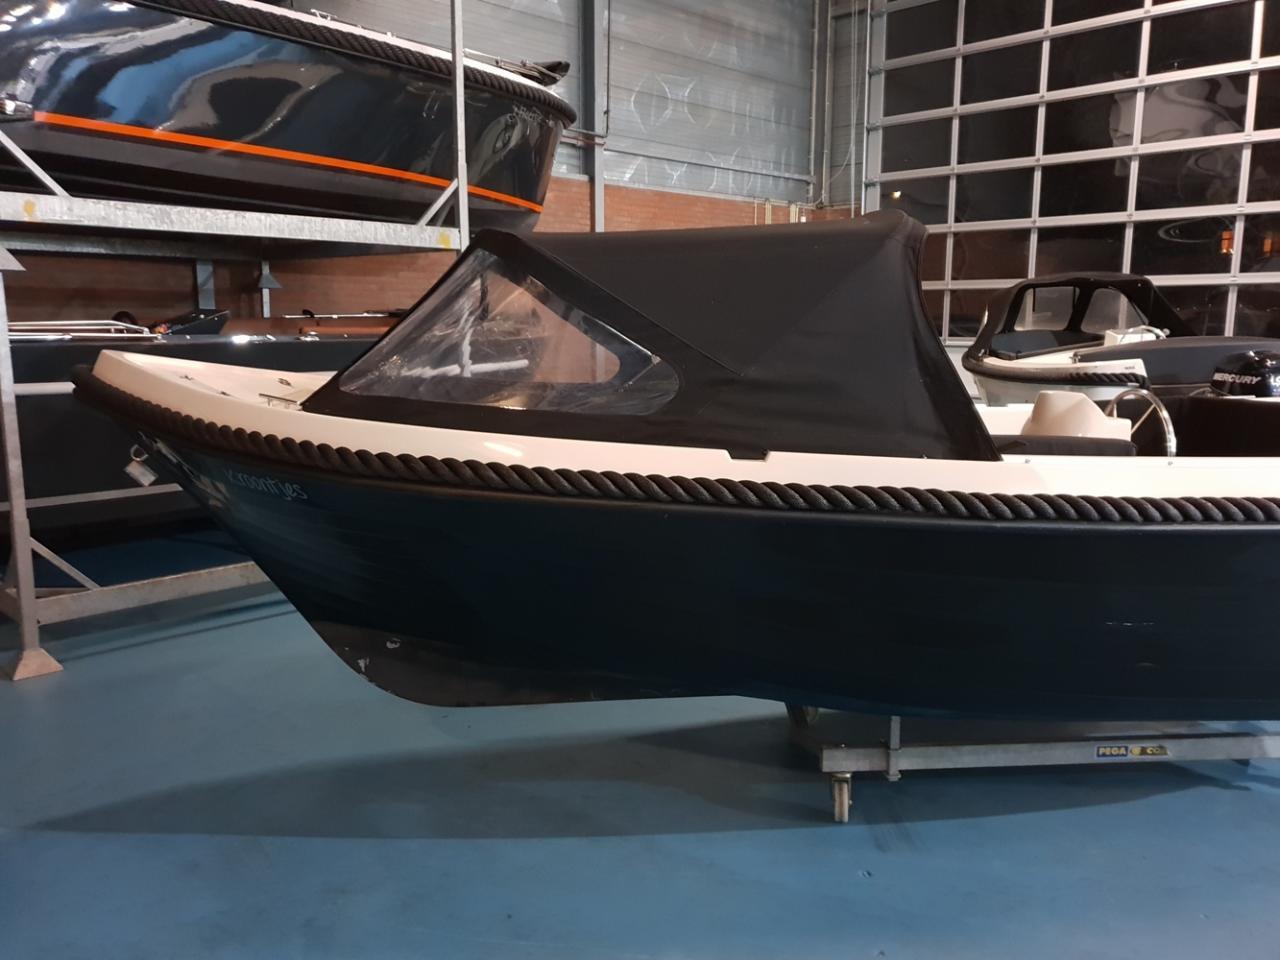 Anker 575 deluxe met Honda 20 pk motor 7